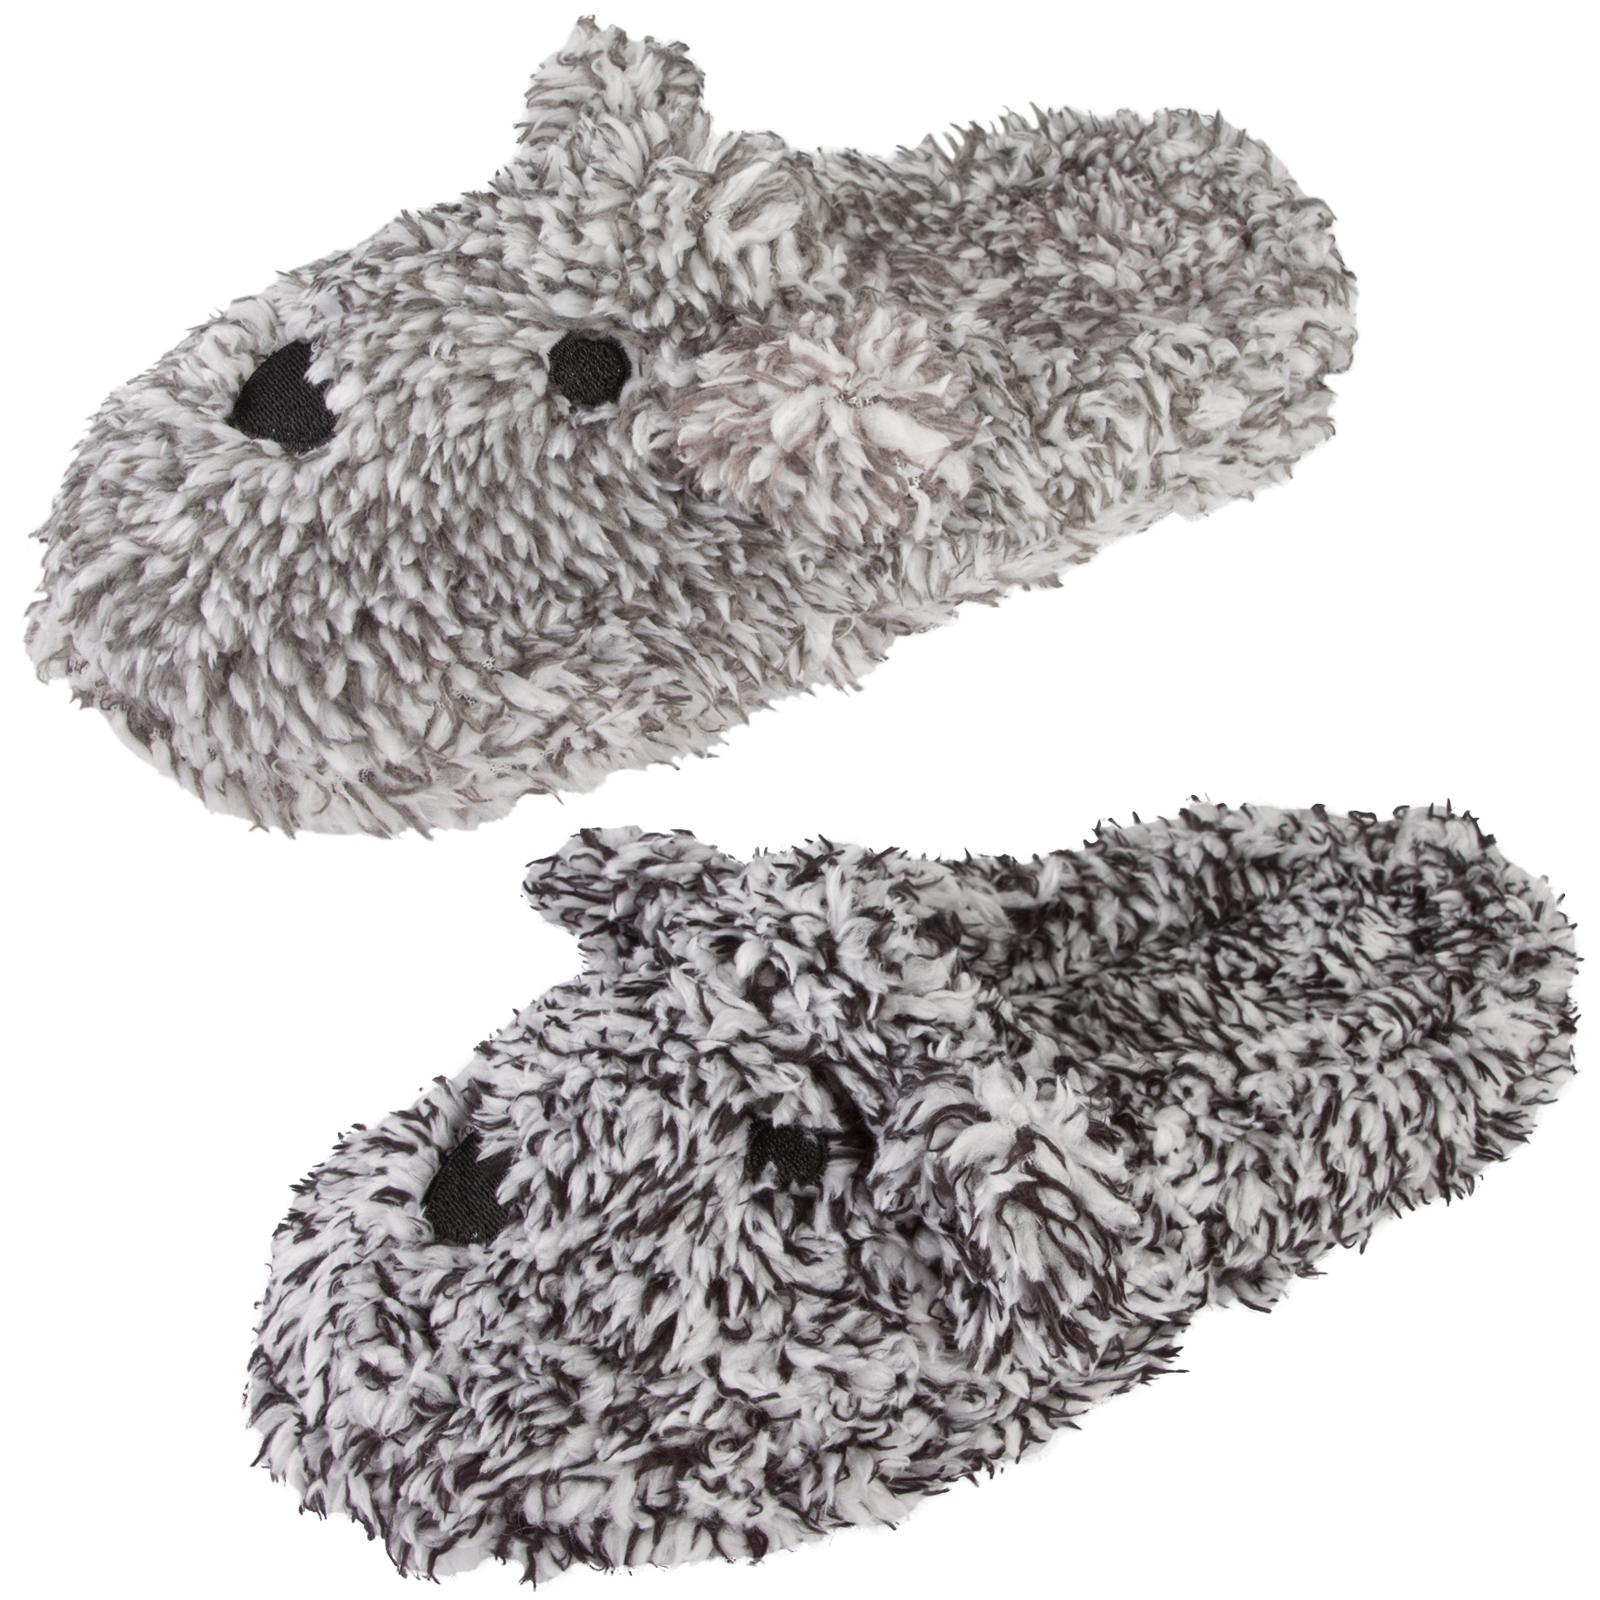 74655fb3549e Womens 3D Novelty Mules Soft Faux Fur Marl Teddy Bear Slippers Xmas ...